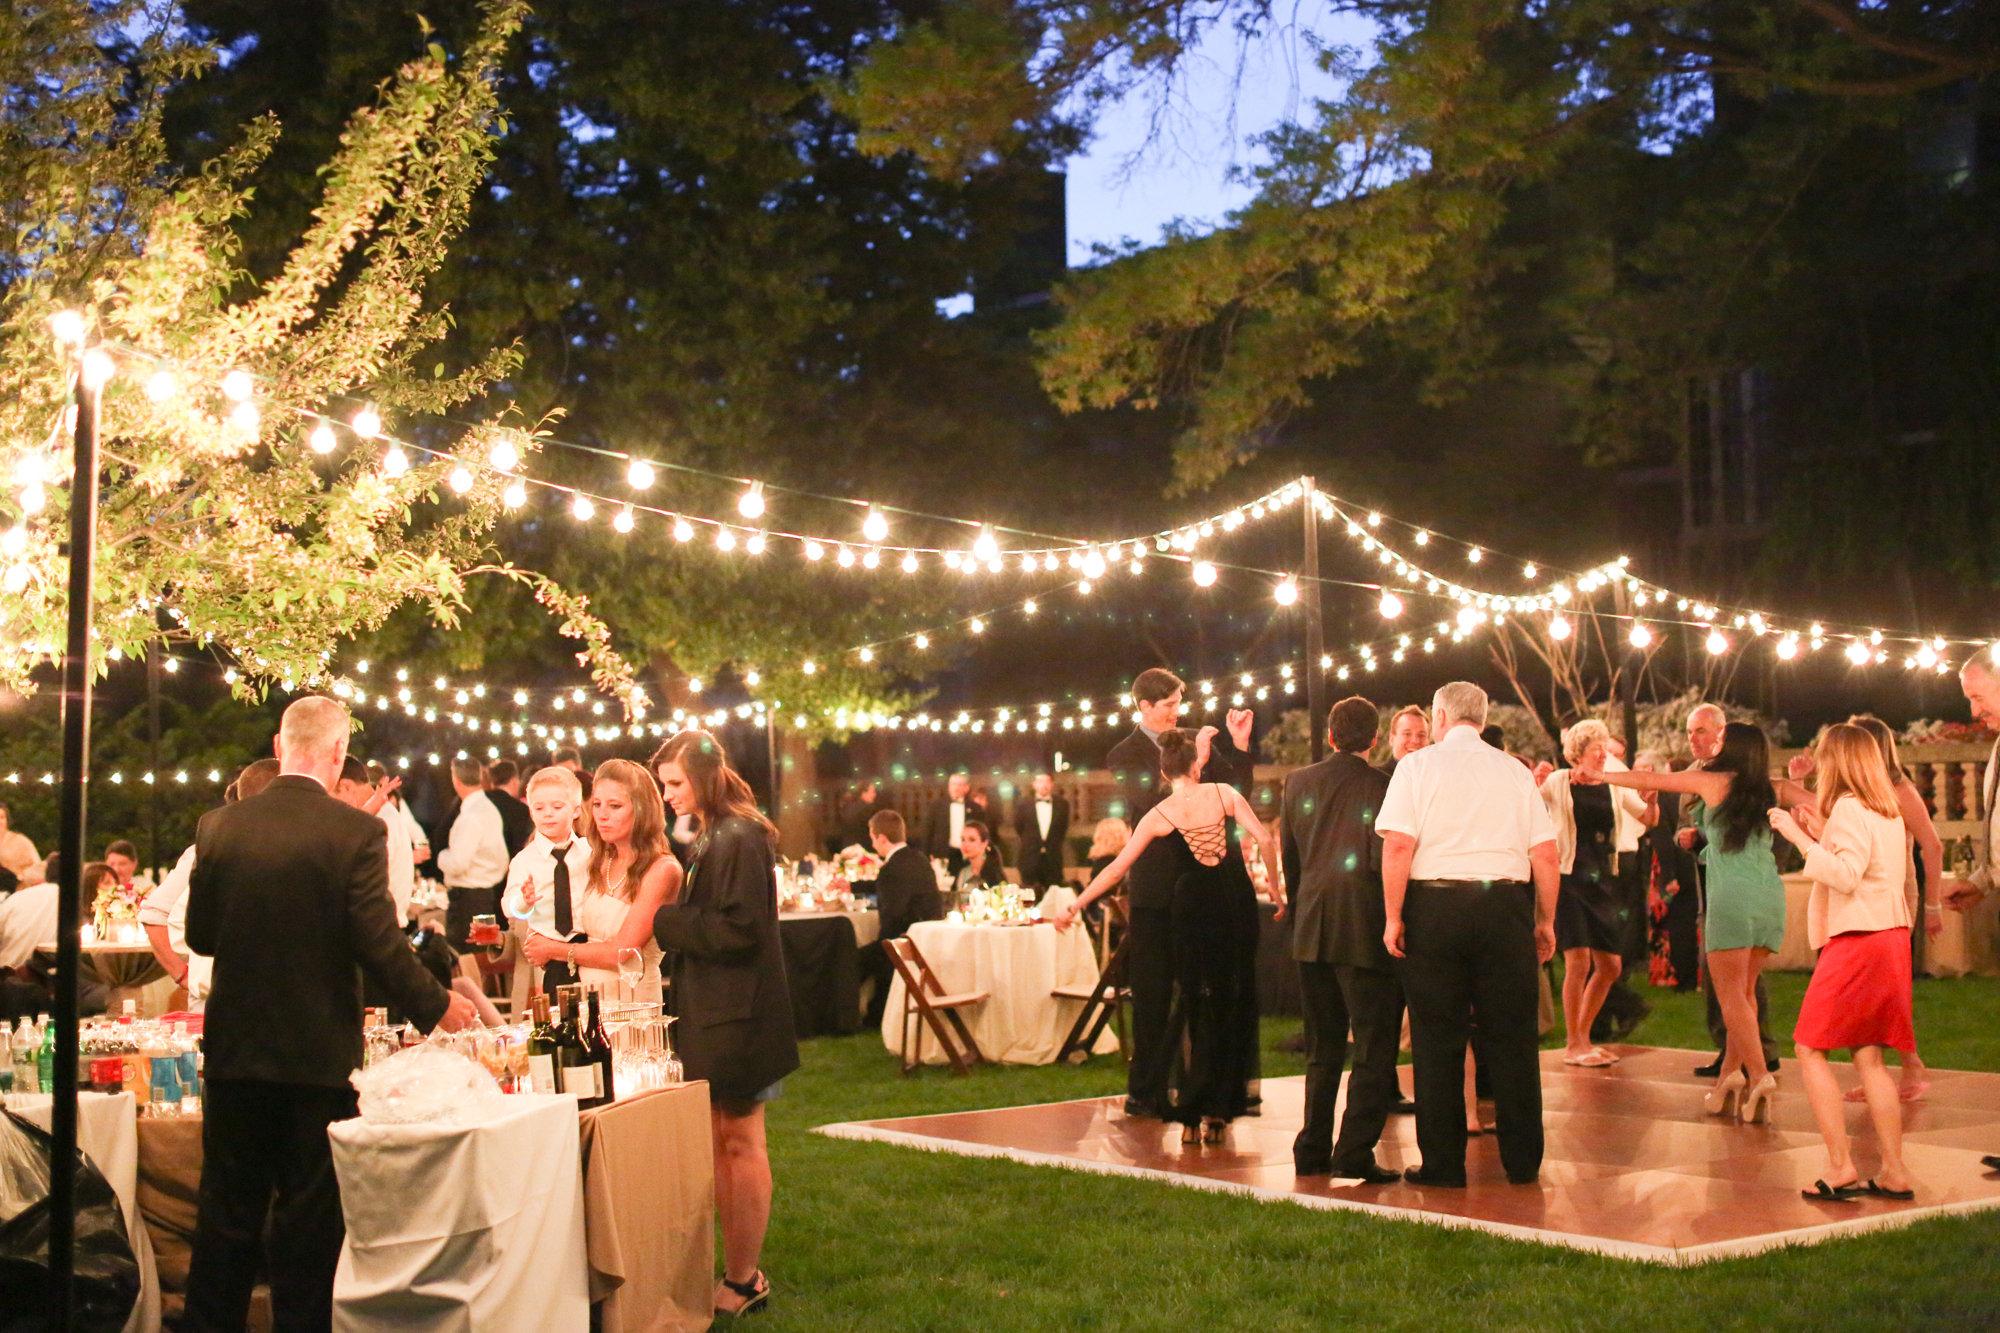 creative-of-outdoor-wedding-reception-venues-near-me-17-best-ideas-about-wedding-venues-oregon-on-pinterest-outdoor.jpg